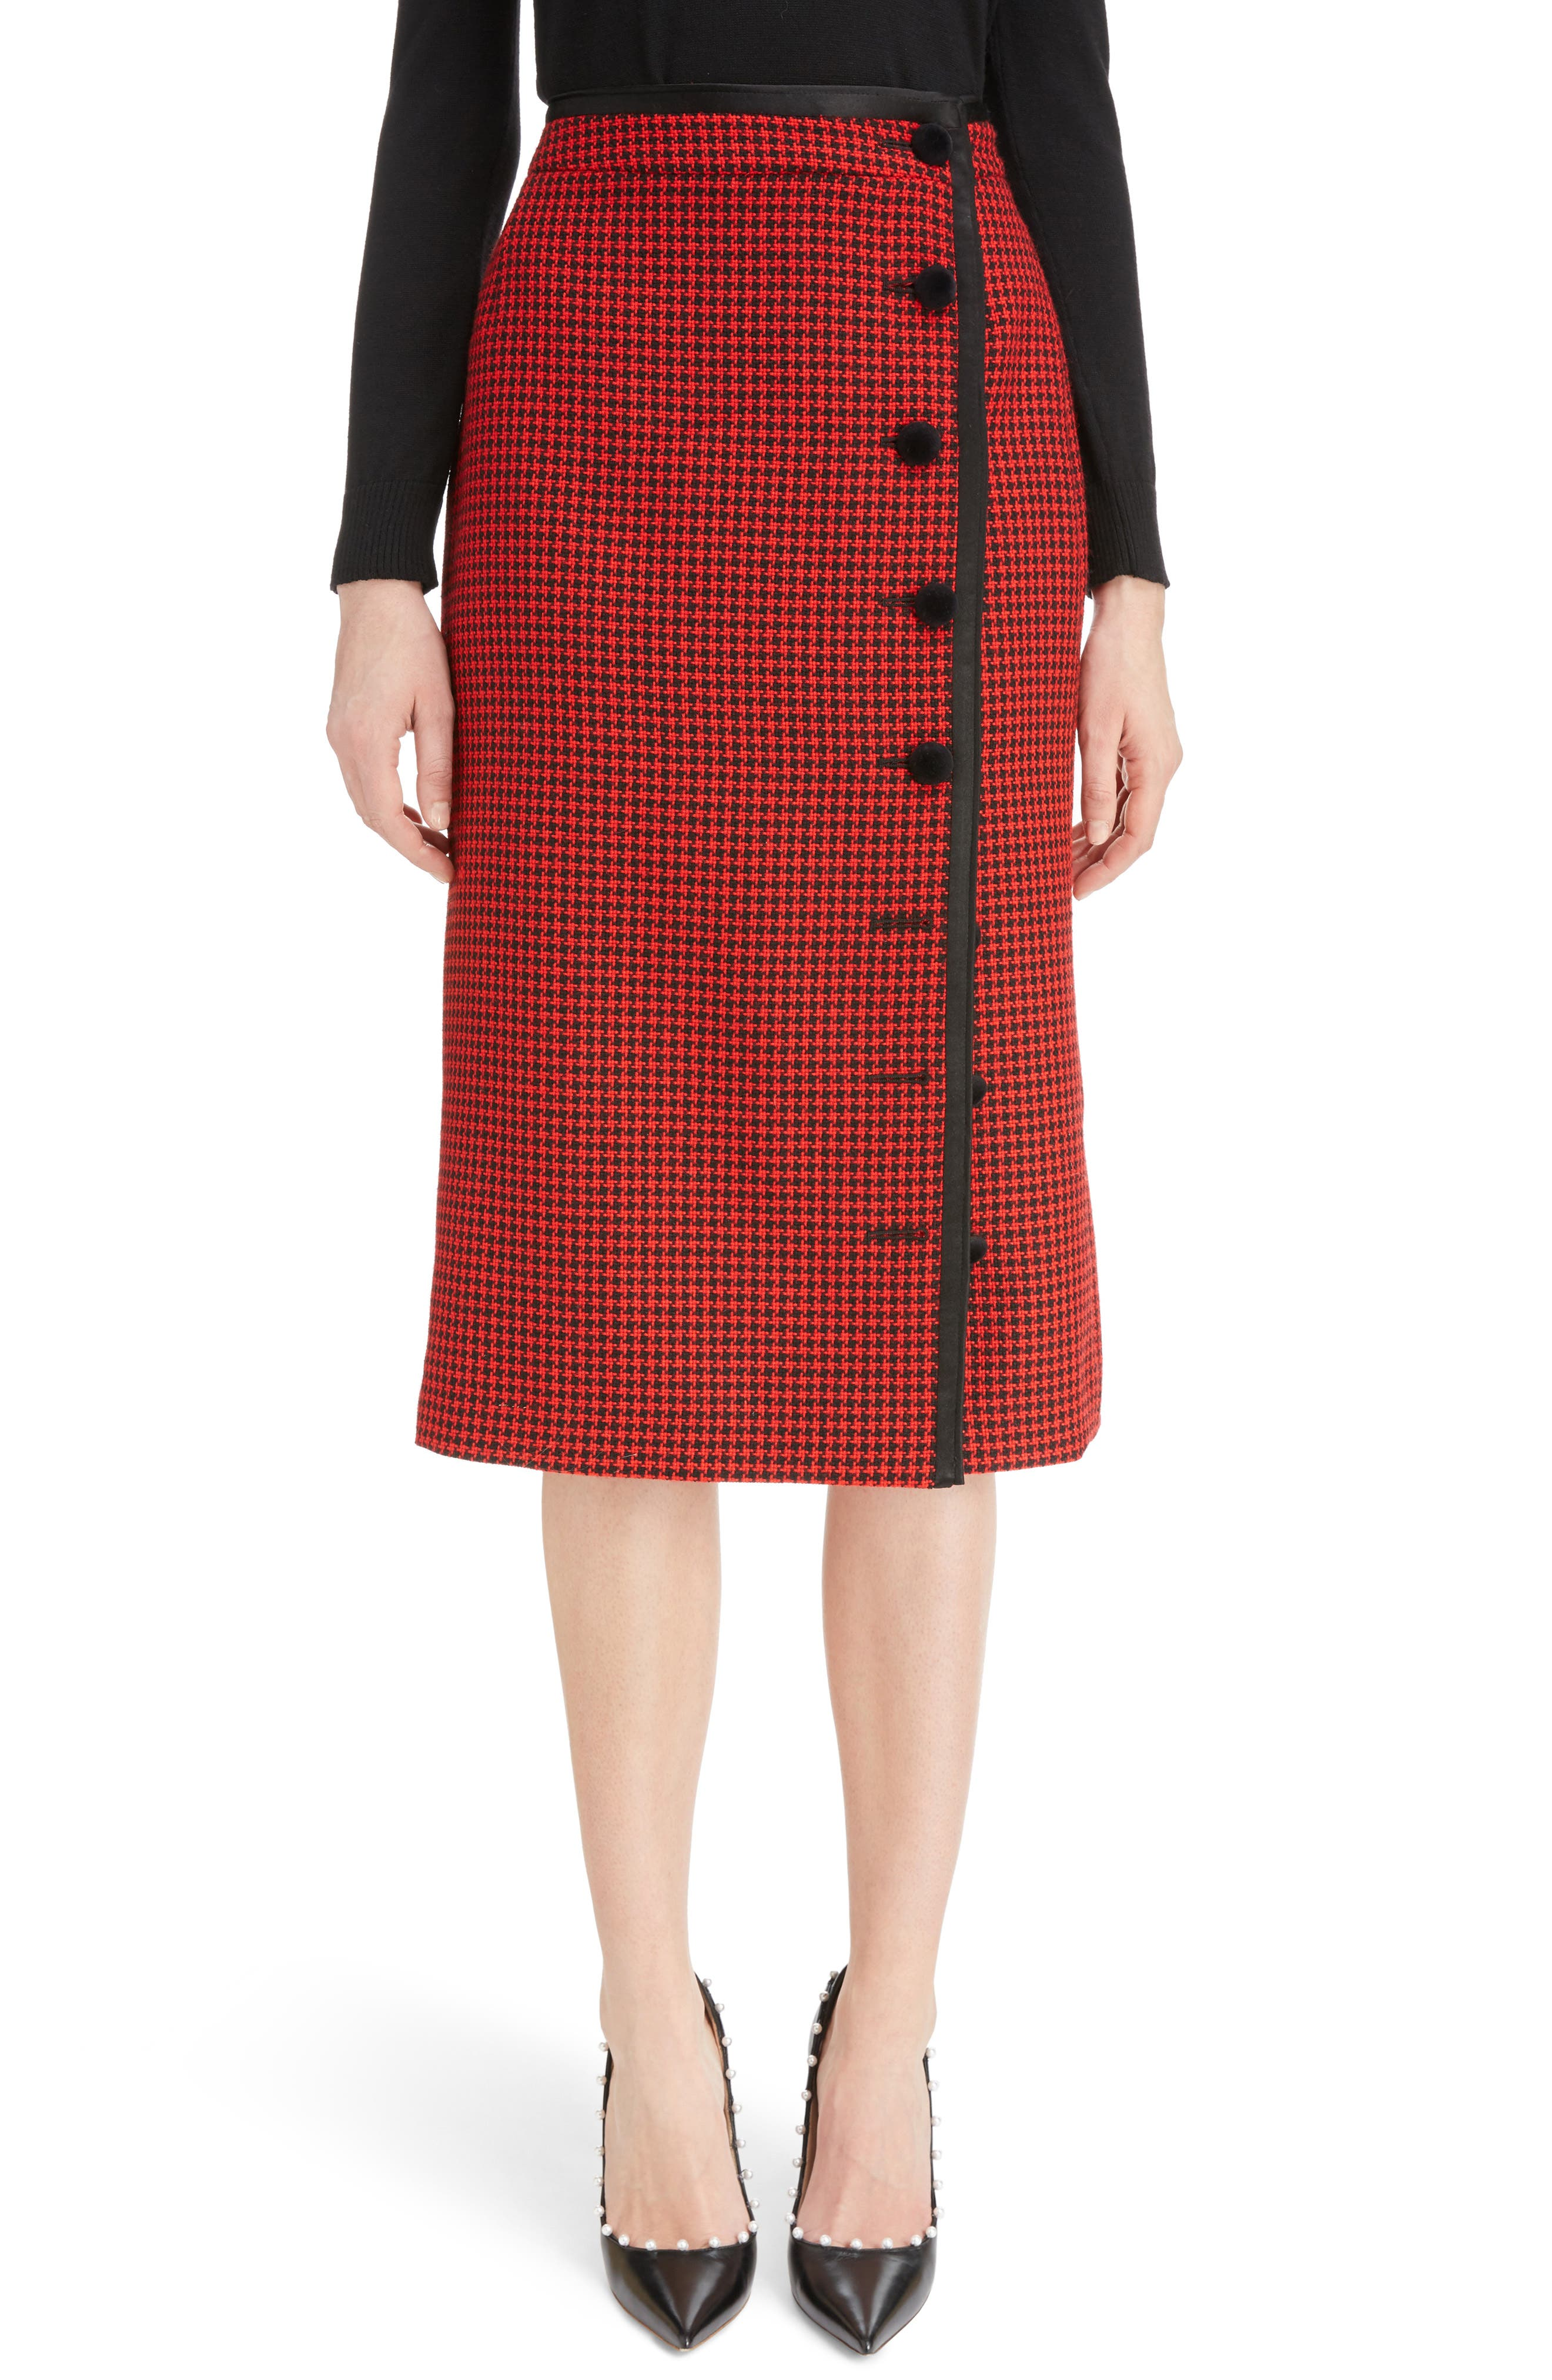 Christofor Houndstooth Wool Skirt,                         Main,                         color, 623